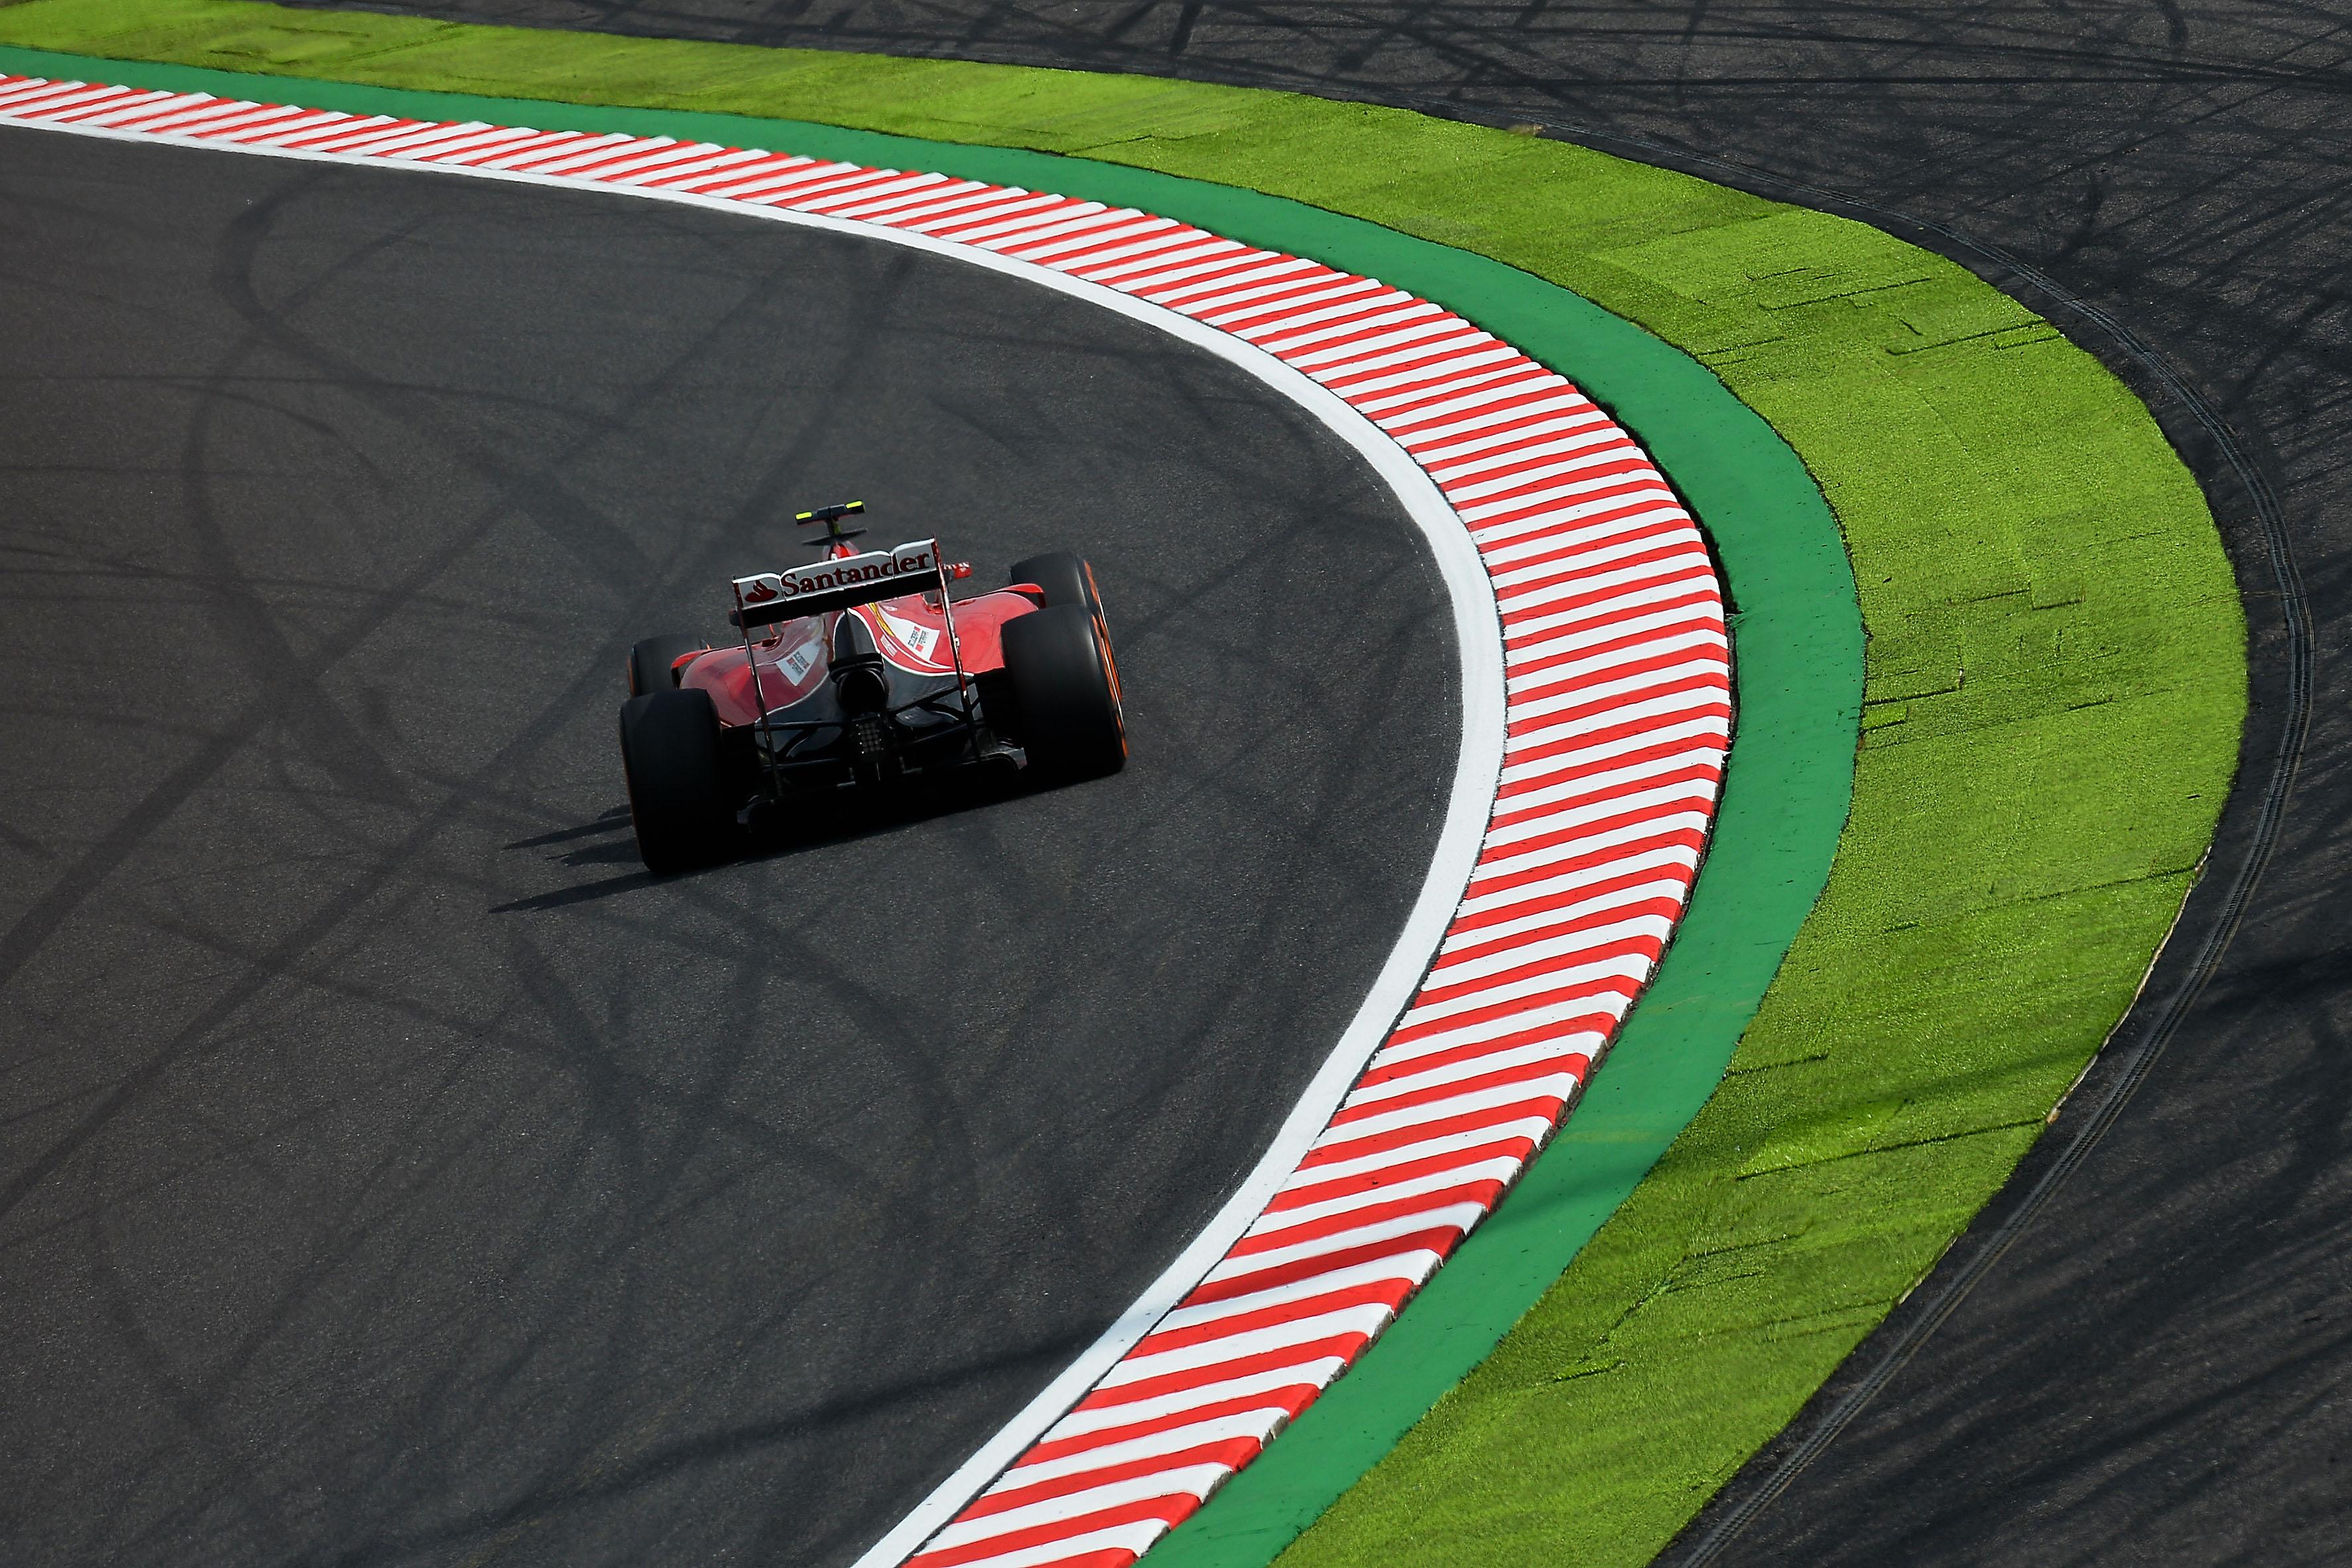 Ferrari a Suzuka senza facili entusiasmi